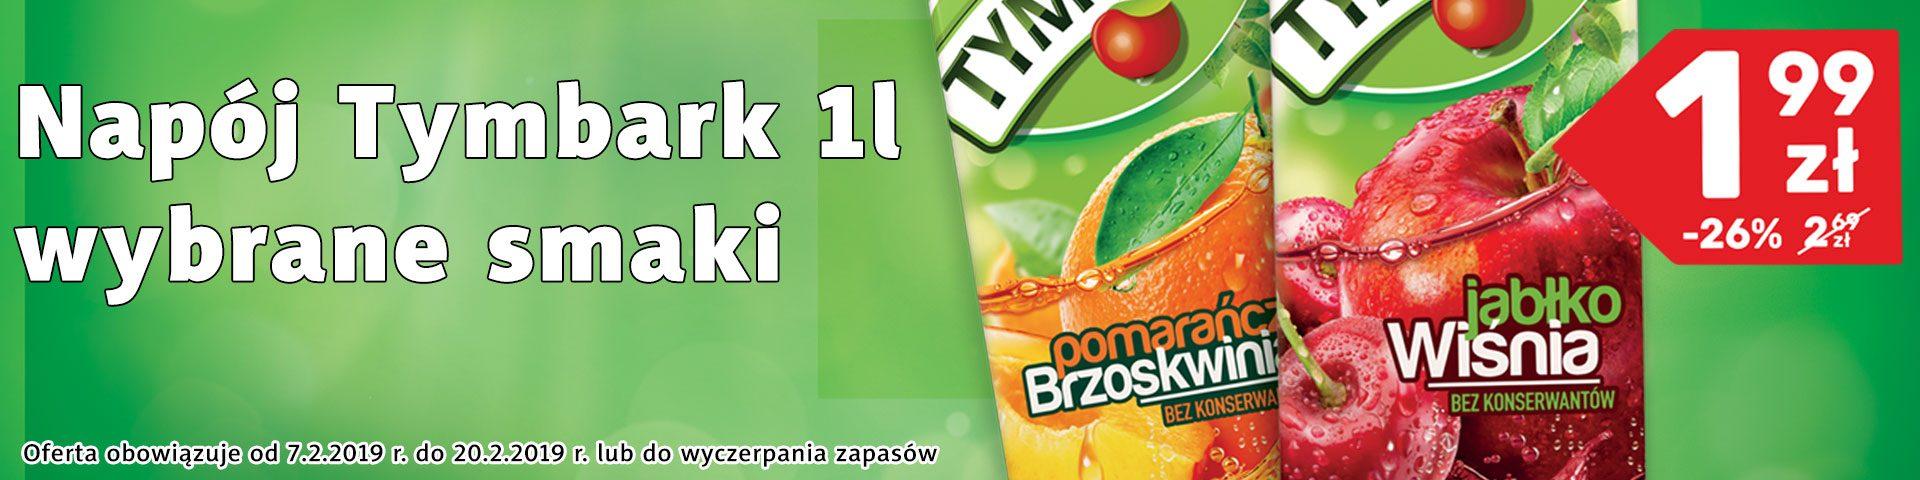 7-20.02.2019_napoj_tymbark